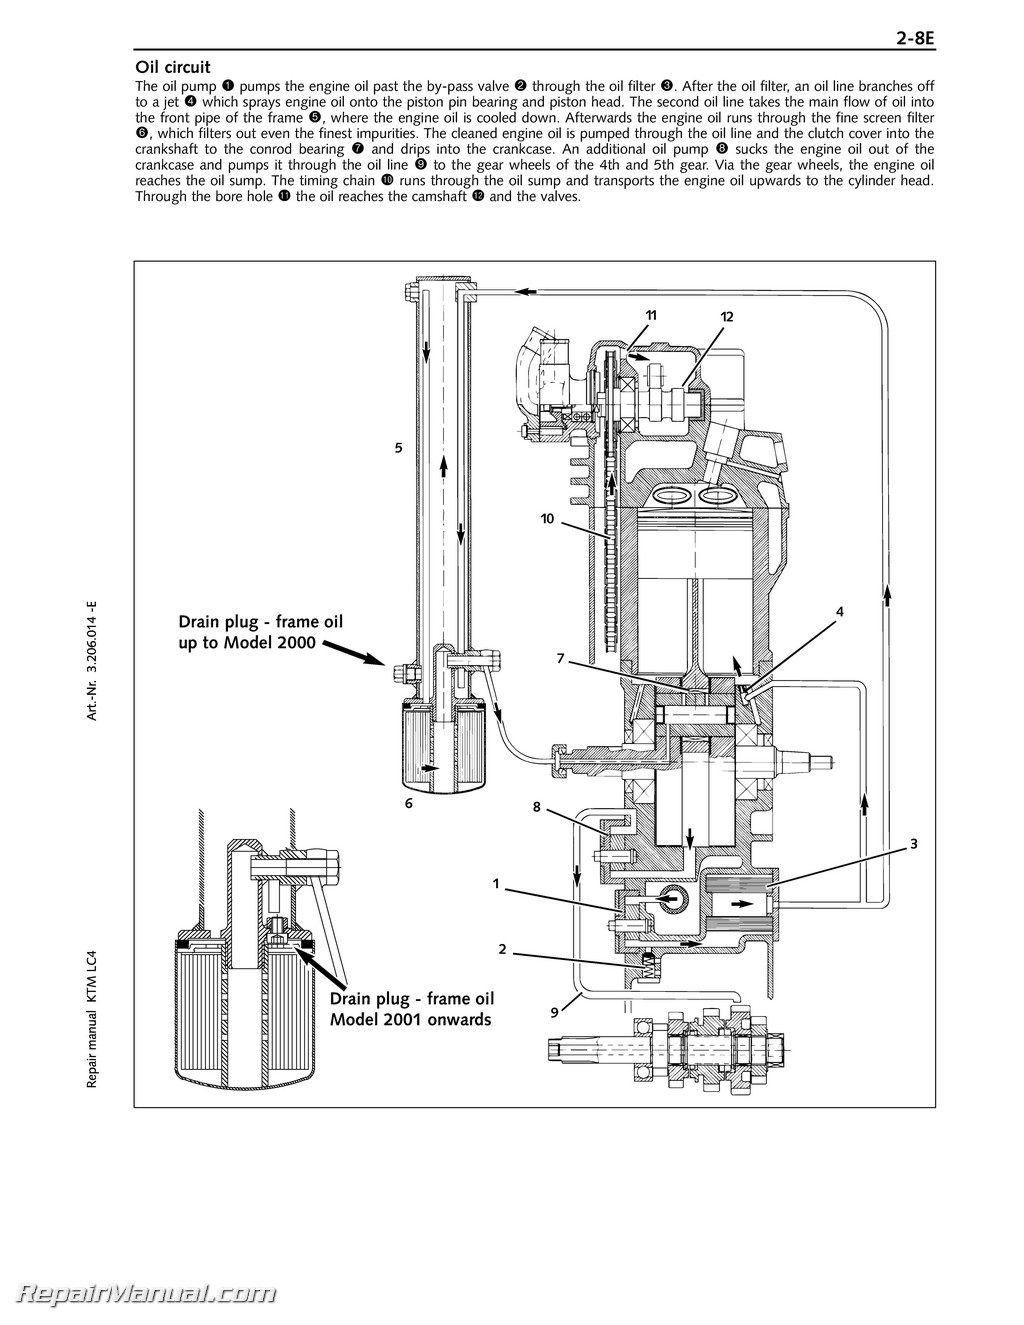 Wiring Diagram 1995 Ktm Lc4 Chevy 3 5l Engine Parts Diagram Jimny Waystar Fr